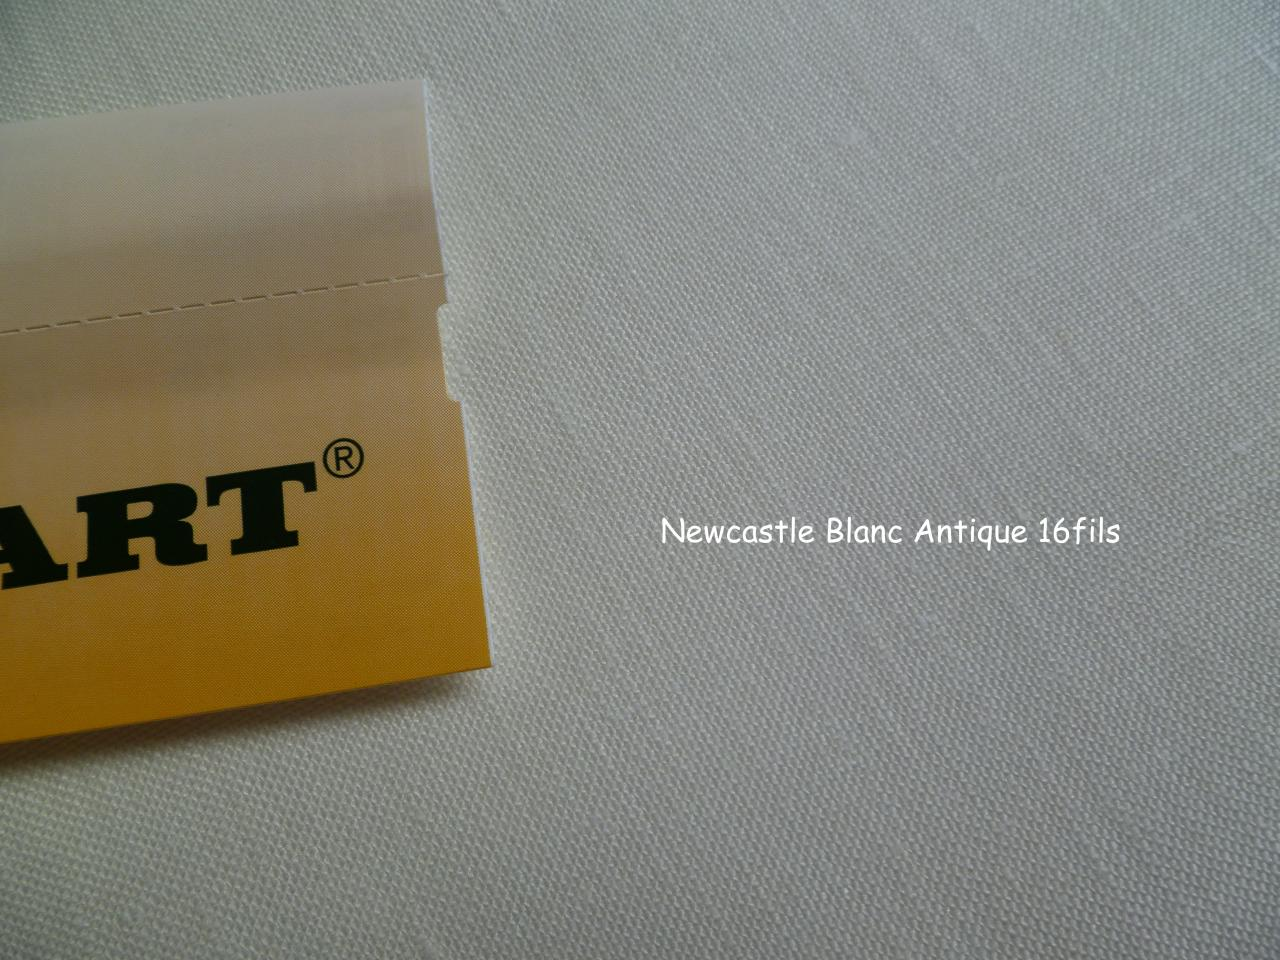 newcastle-blanc-antique-16fils.jpg